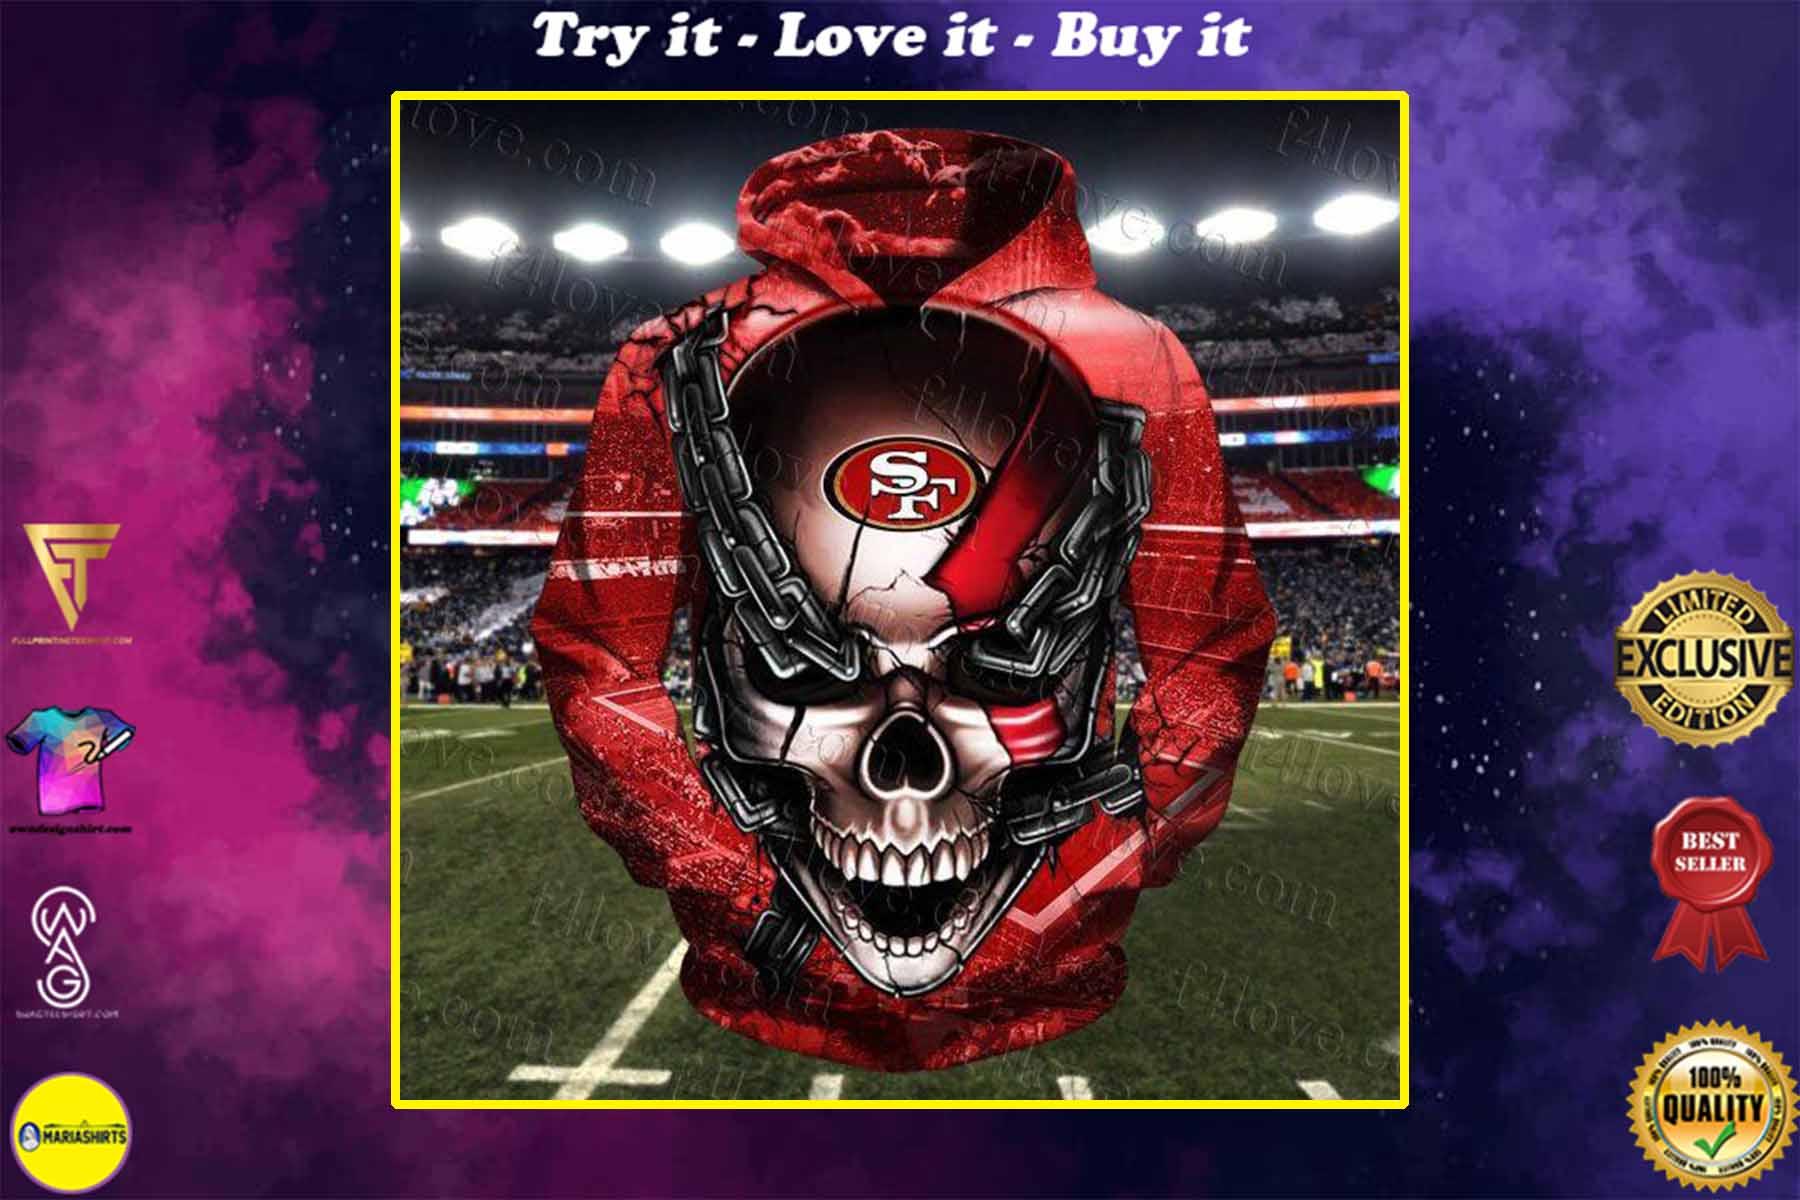 [highest selling] skull chain san francisco 49ers football team full over printed shirt - maria